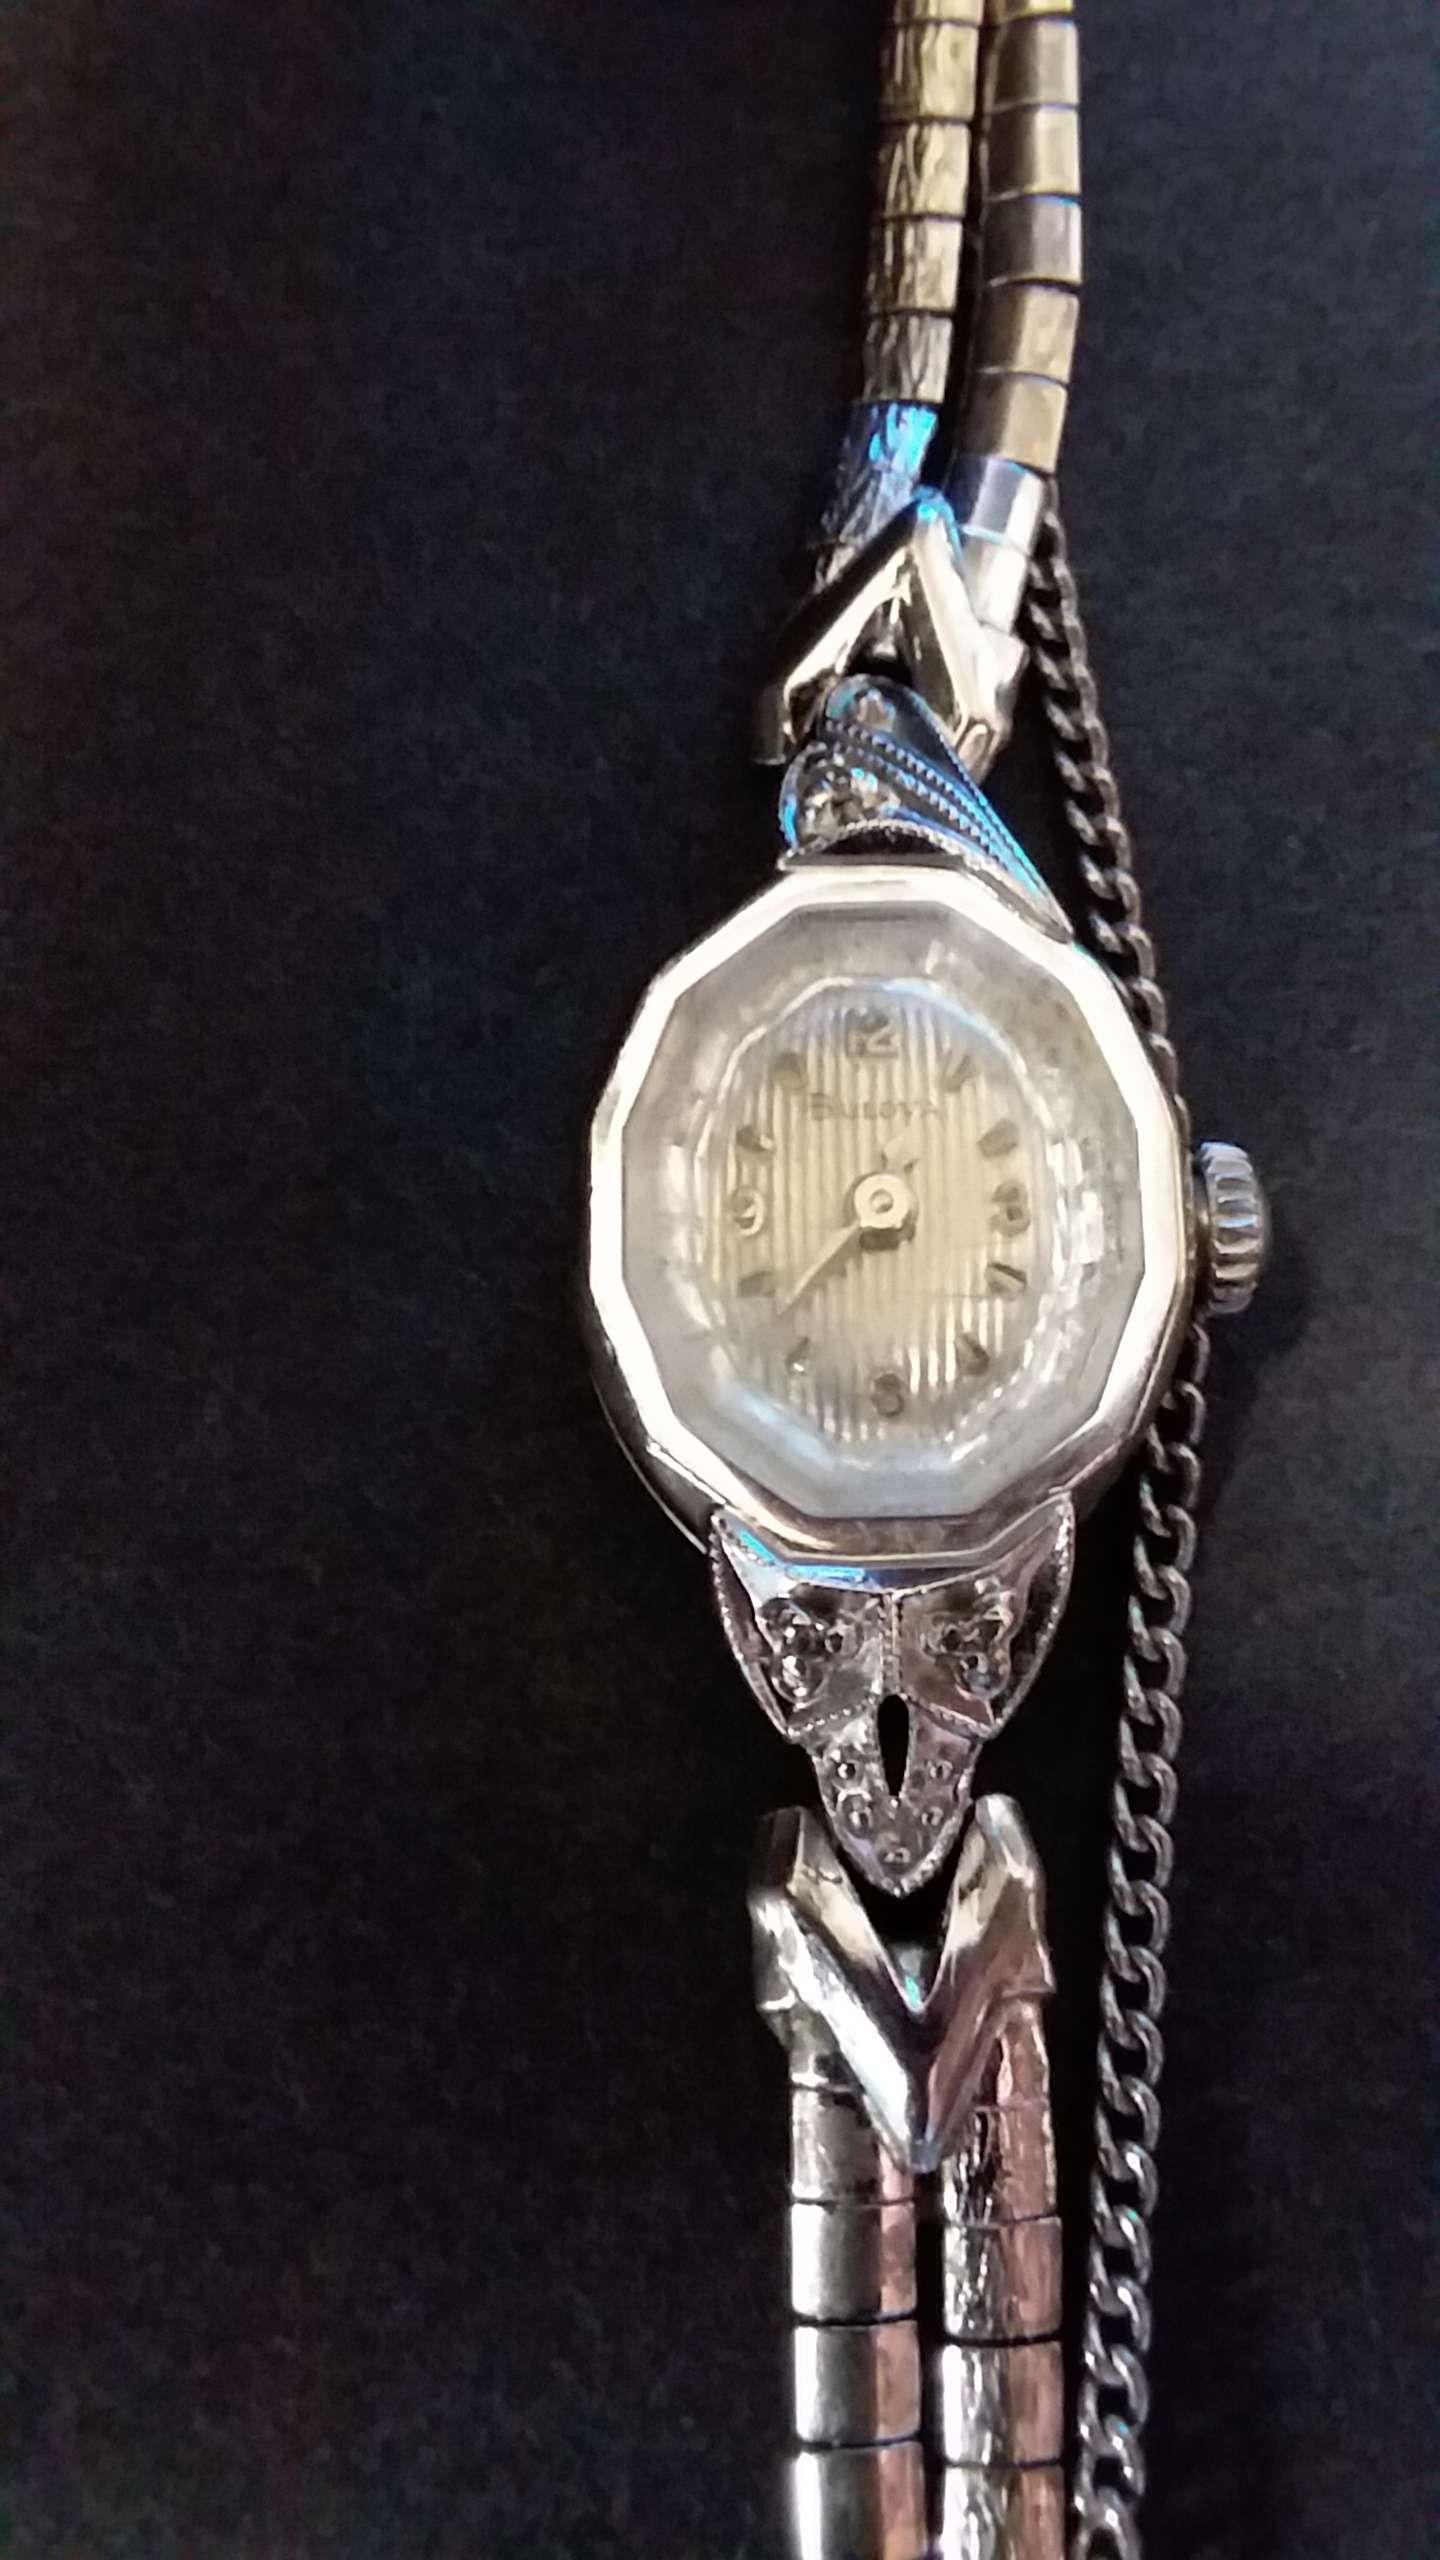 [1967] Bulova watch